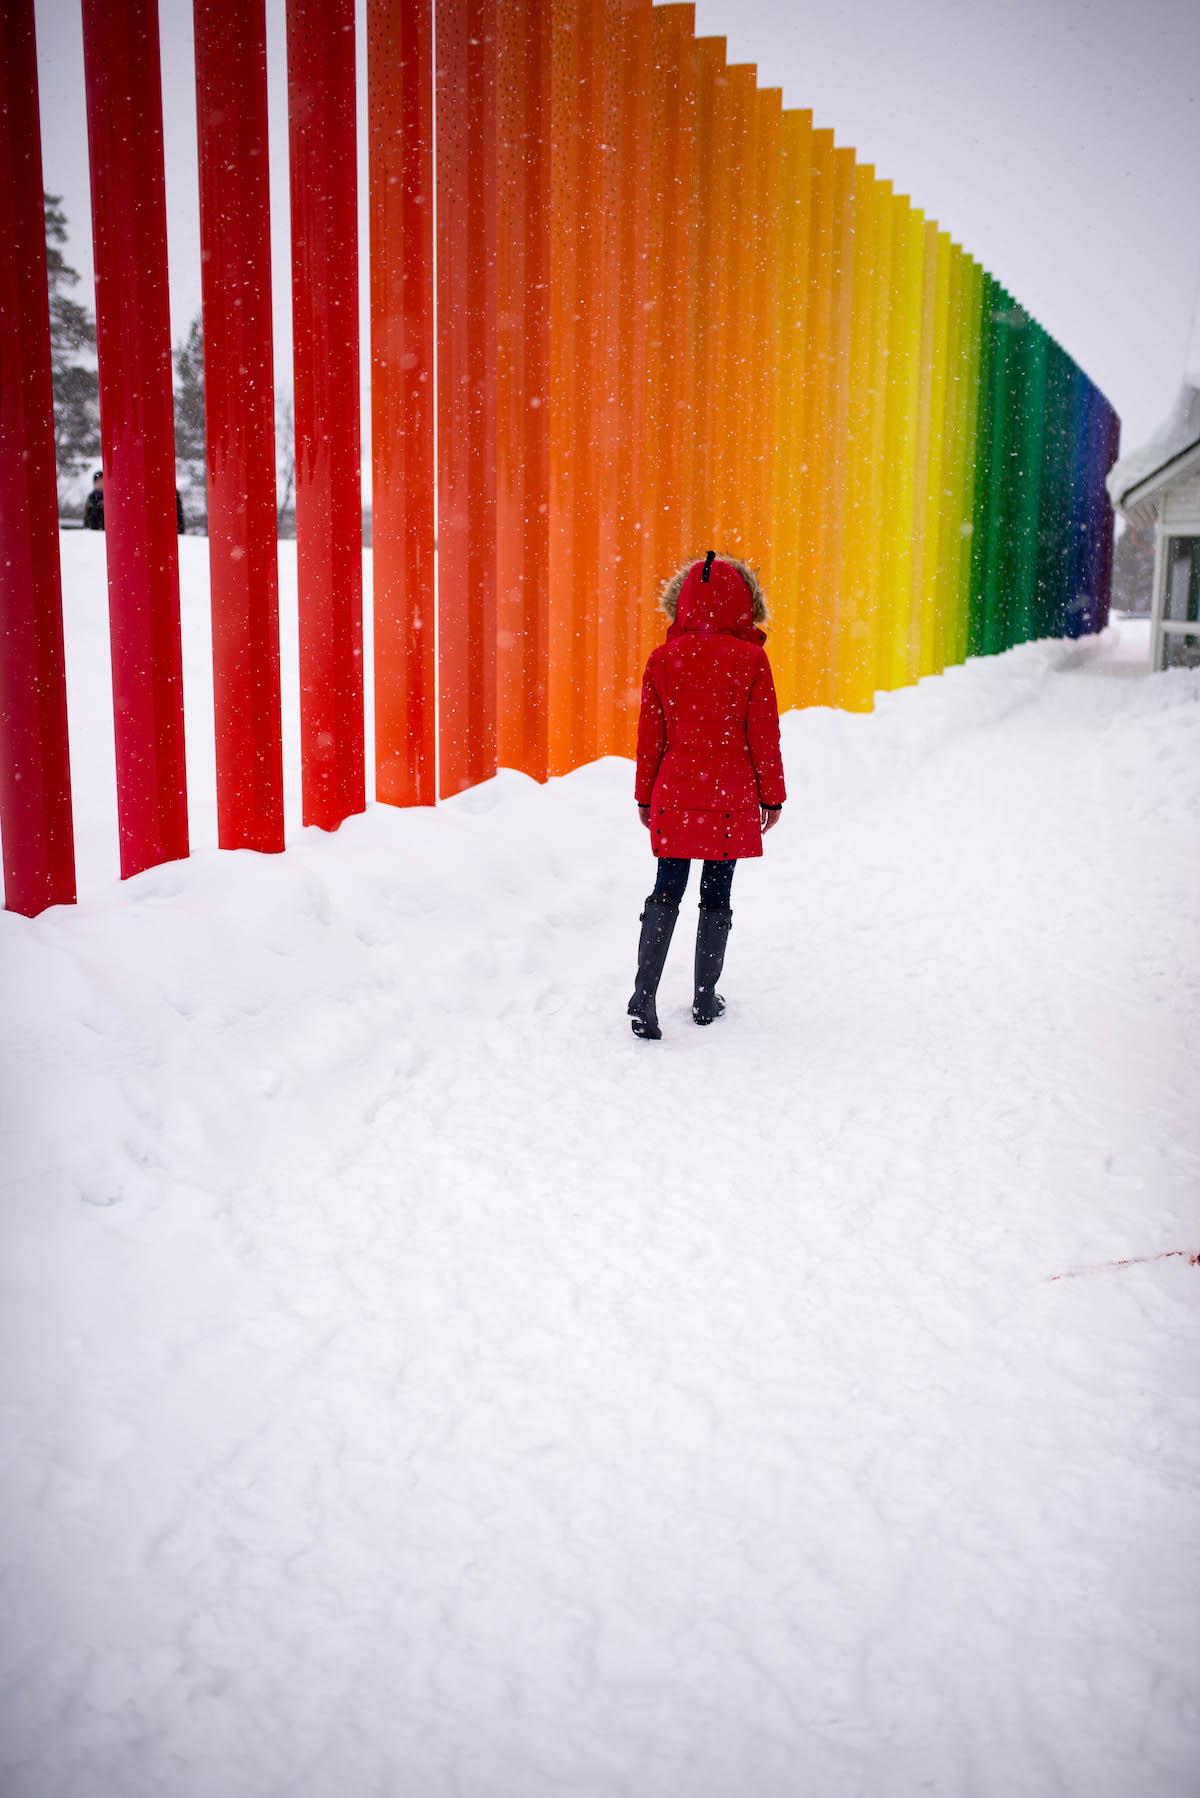 Saariselk 228 Spectrum The Most Colorful Fence In Finland